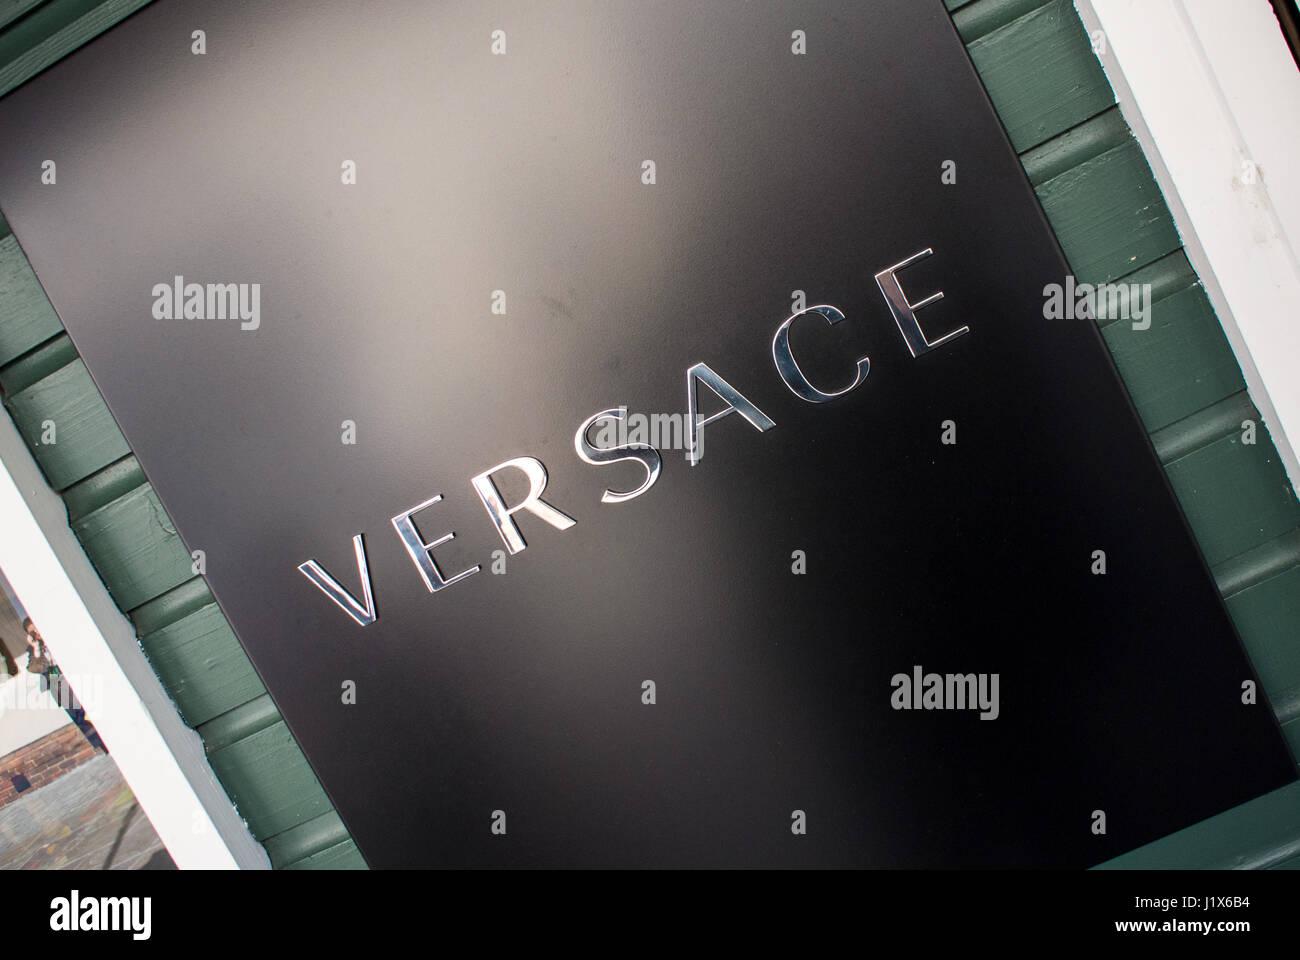 Versace logo stock photos versace logo stock images alamy versace brand stock image biocorpaavc Gallery